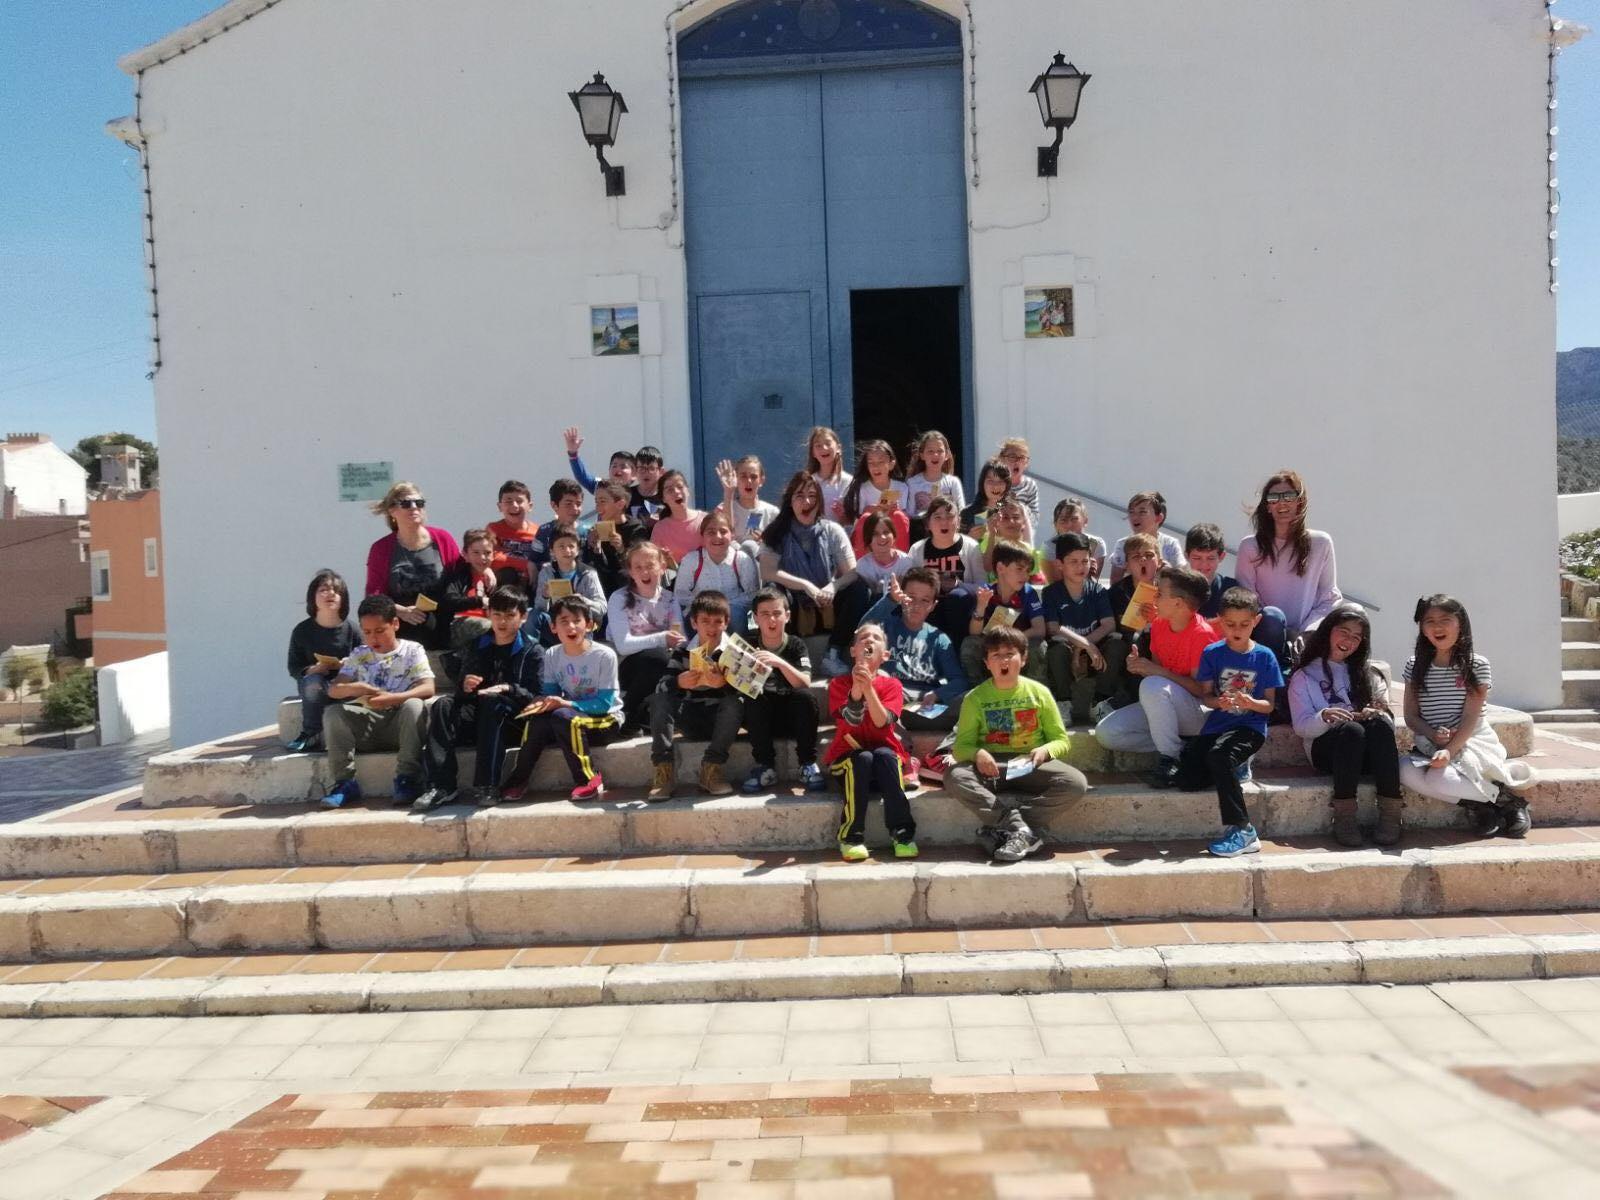 (2018-04-18) - Visita ermita alumnos Beatriz-Carmina-Lucía,3º,La Foia - María Isabel Berenguer Brotons - (01)